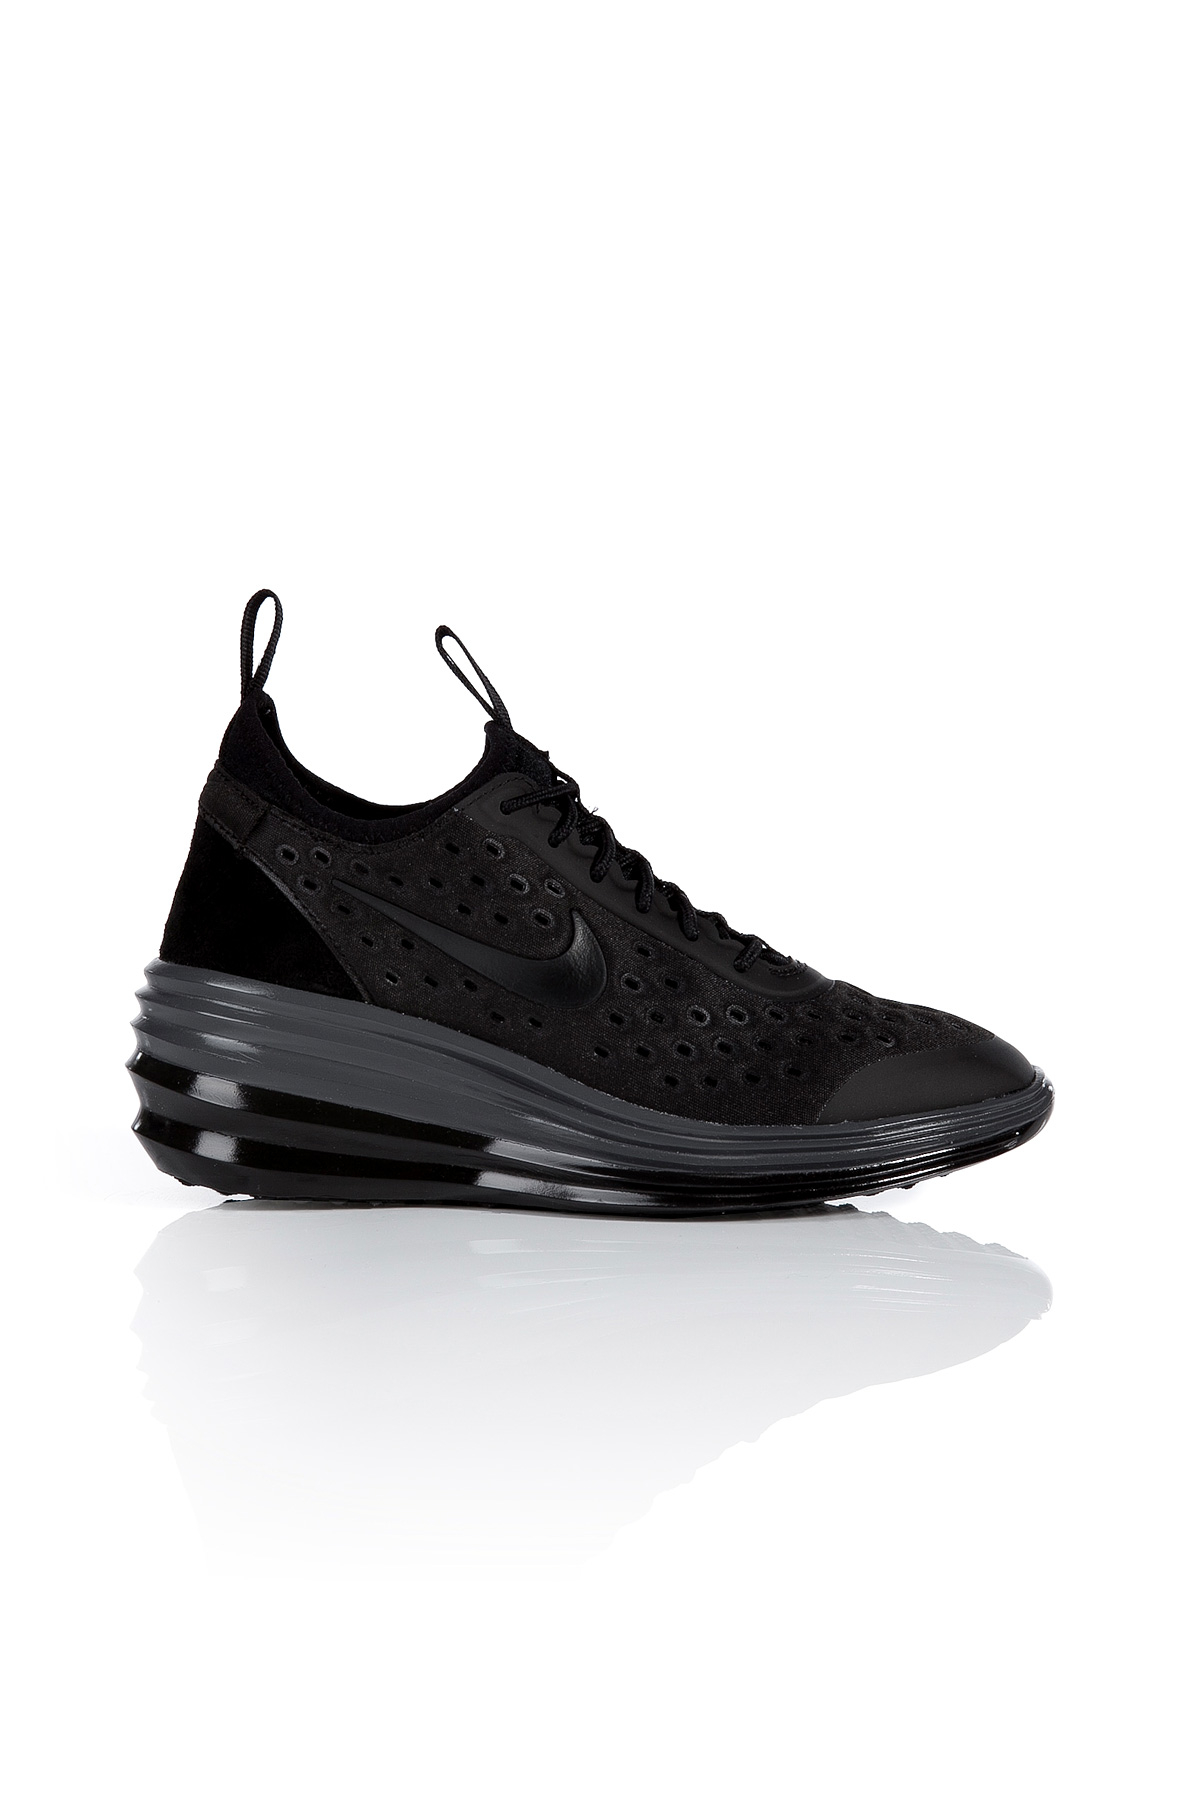 the best attitude 6fb58 8af1b ... coupon for lyst nike lunarelite sky hi wedge sneakers in black 9476b  84de8